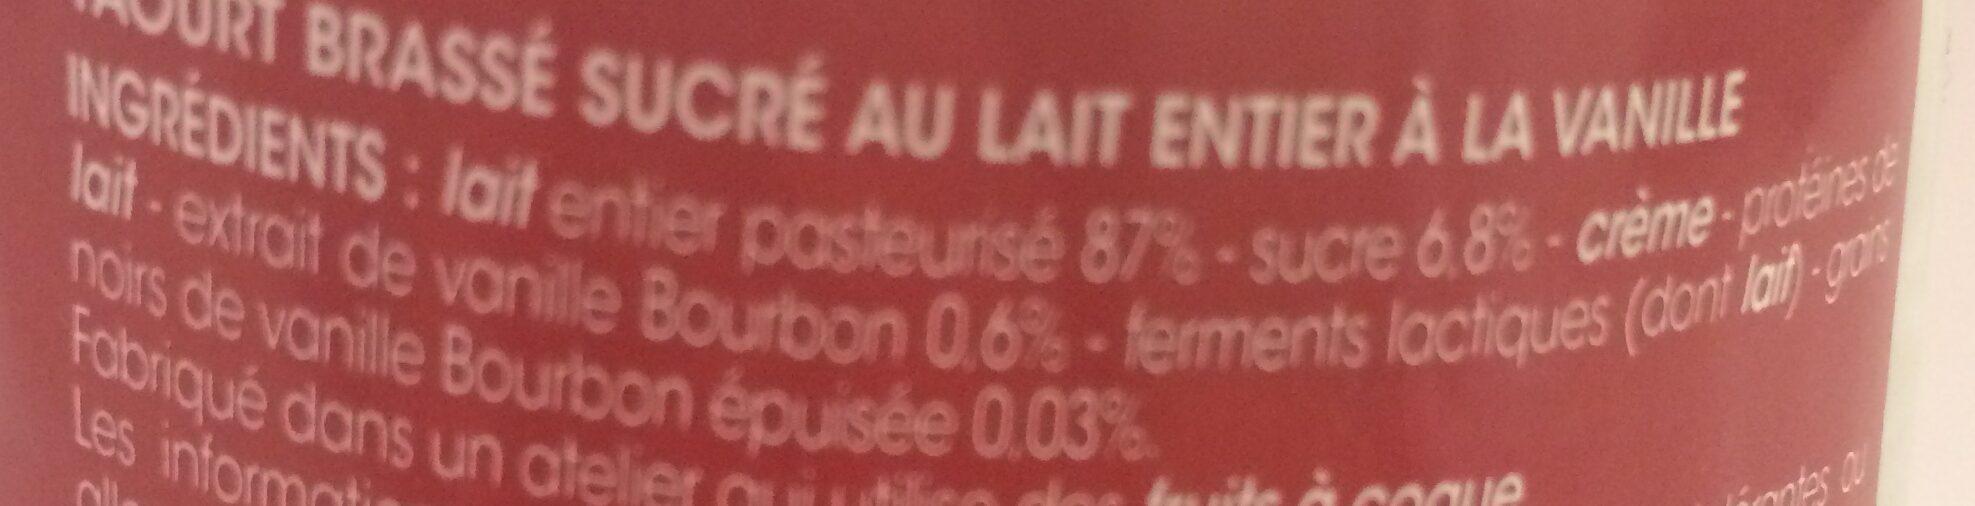 Yaourt brassé vanille - Ingrediënten